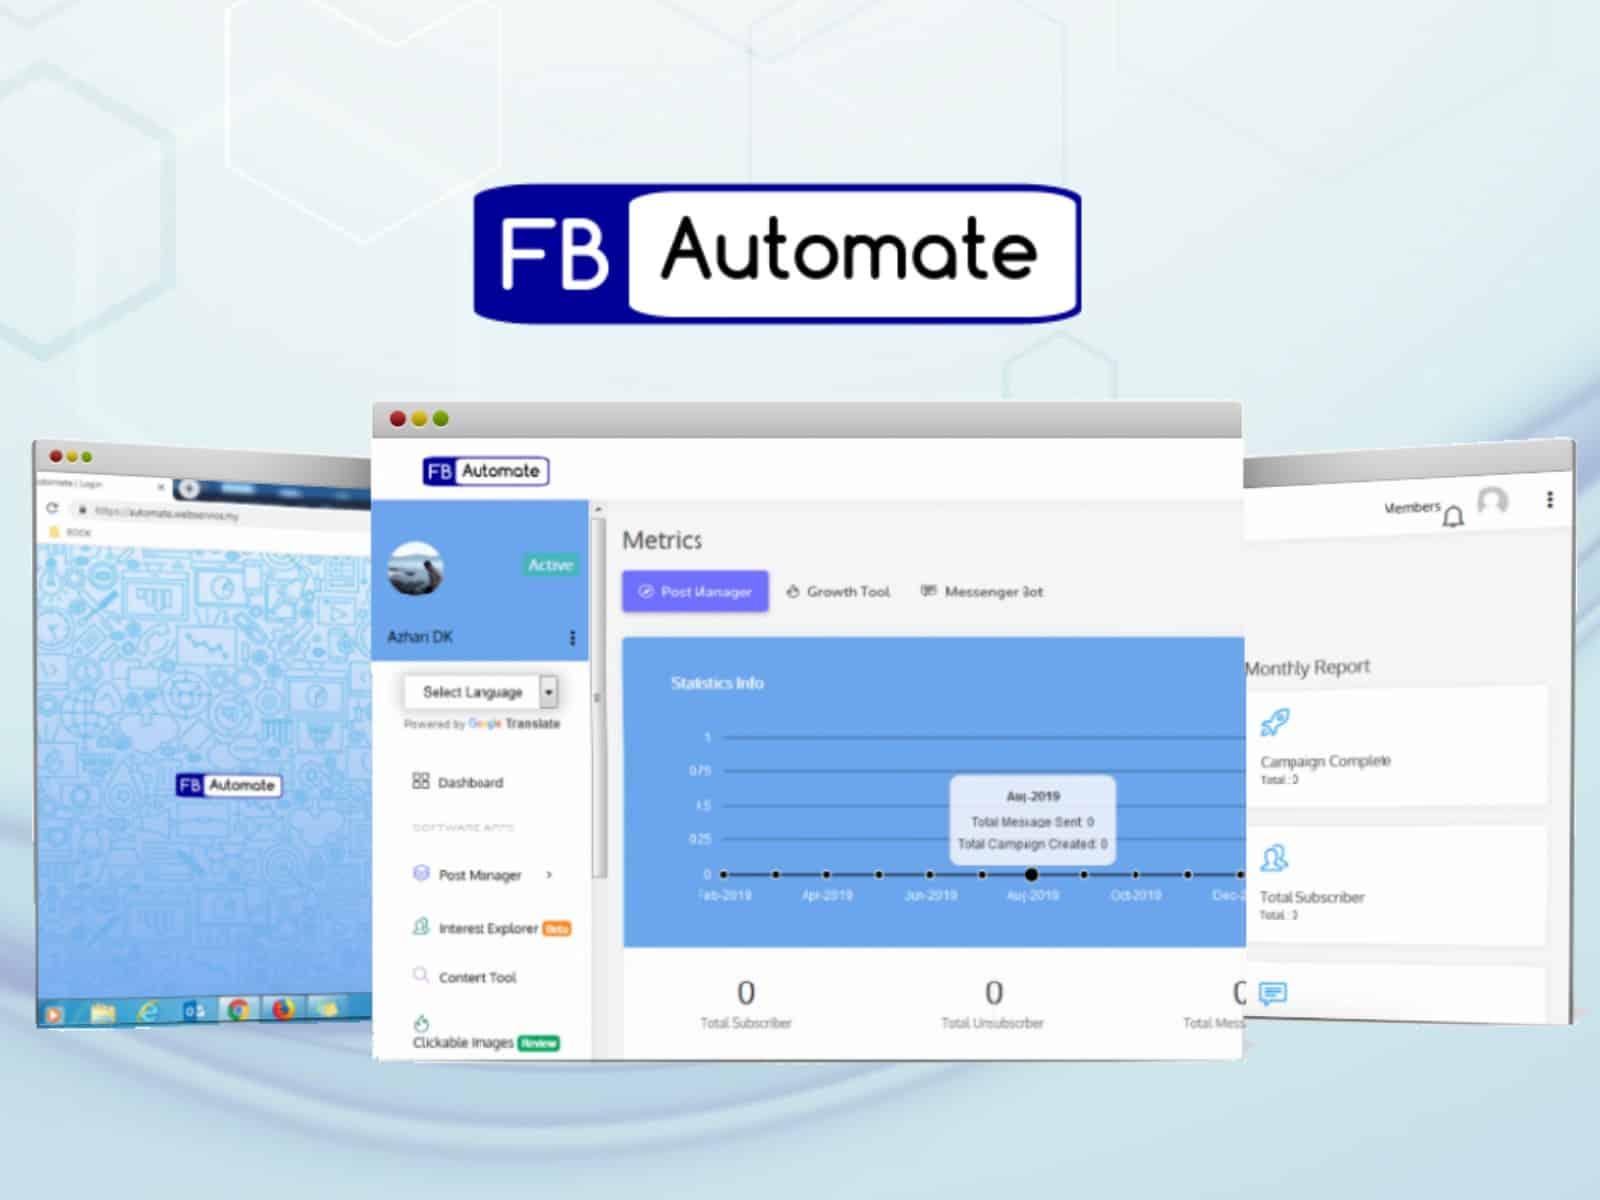 fb-automate-deals